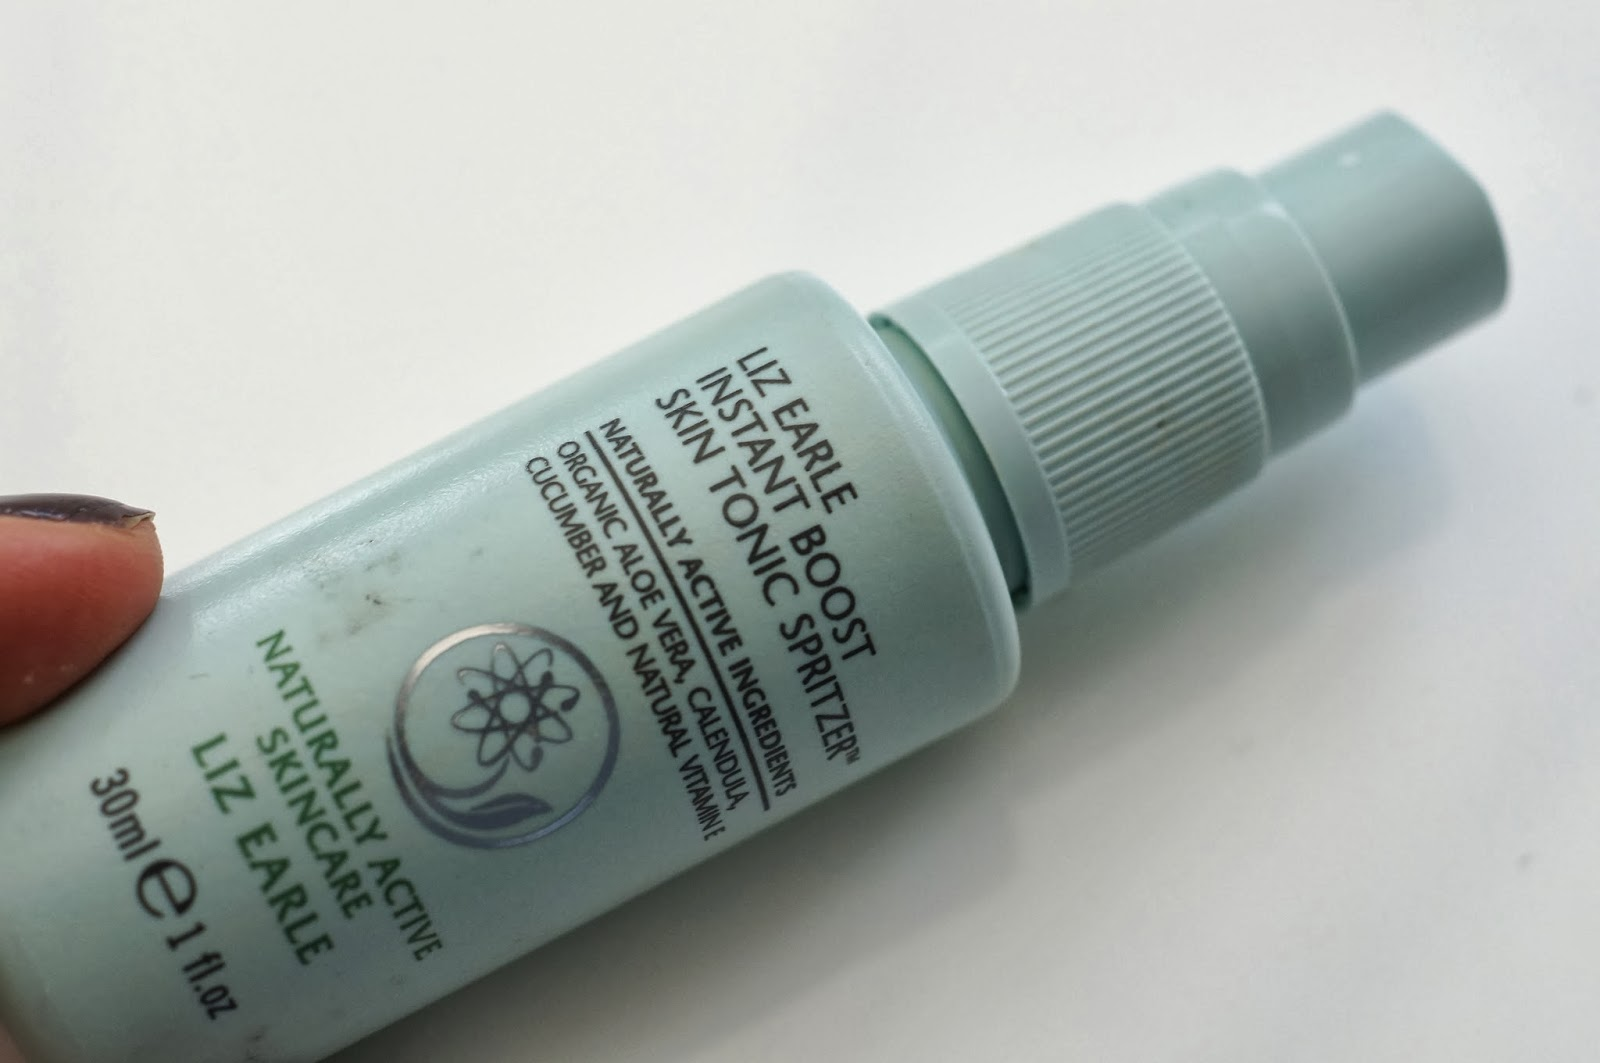 Liz Earle Instant Boost Skin Tonic Spritzer